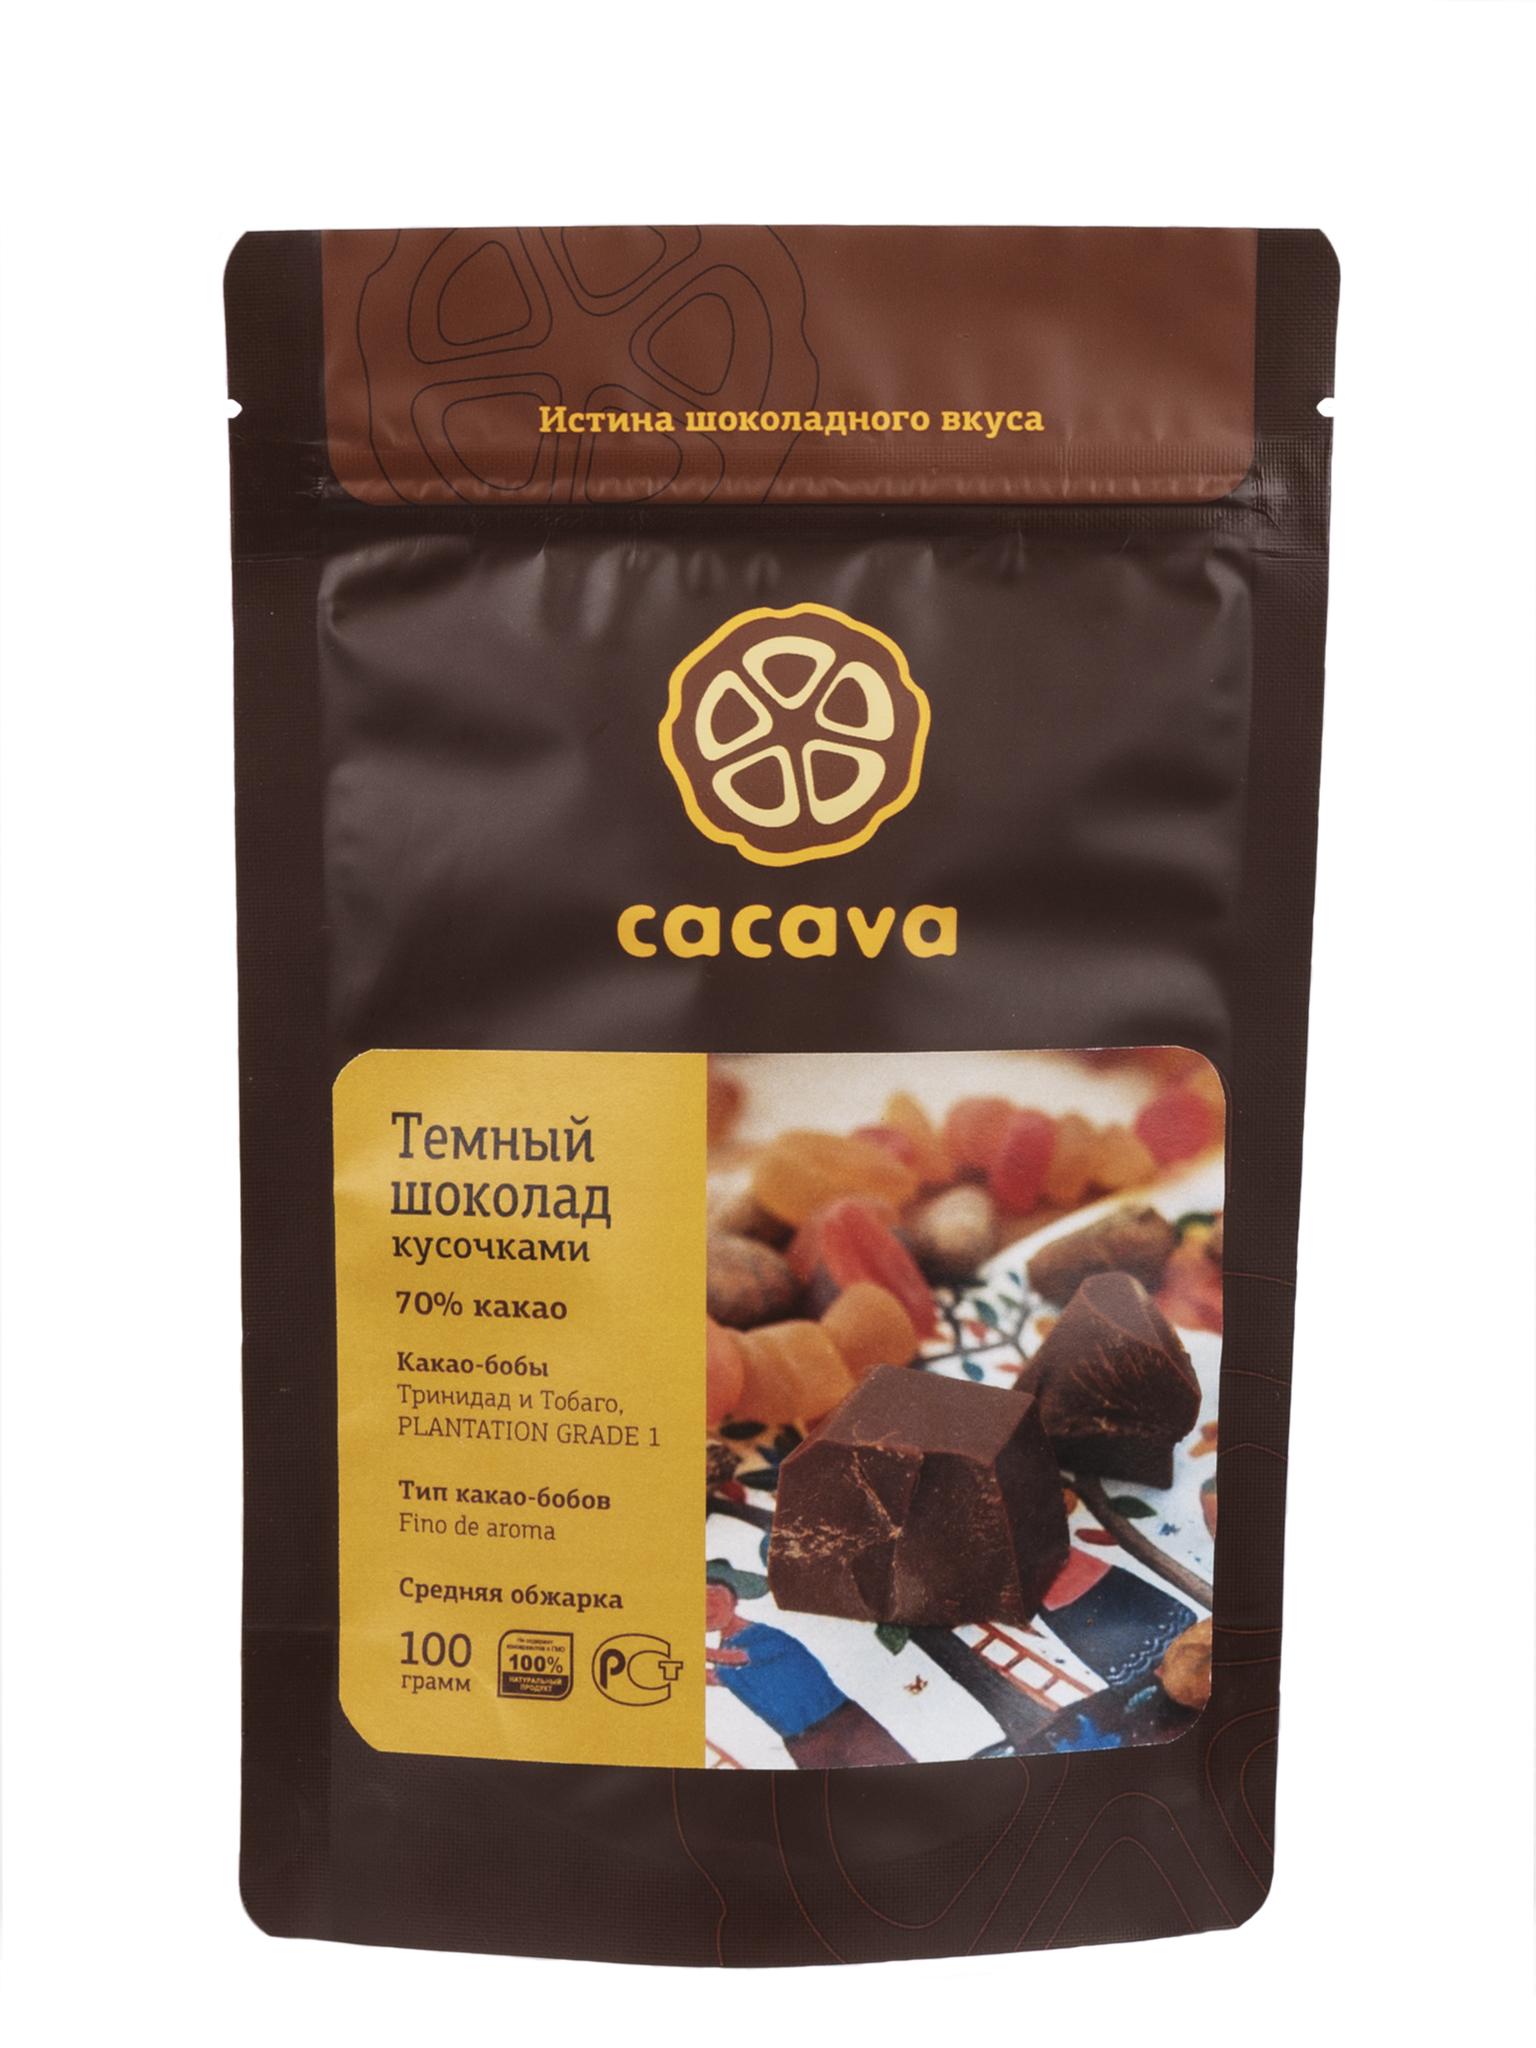 Тёмный шоколад 70% какао (Тринидад), упаковка 100 грамм